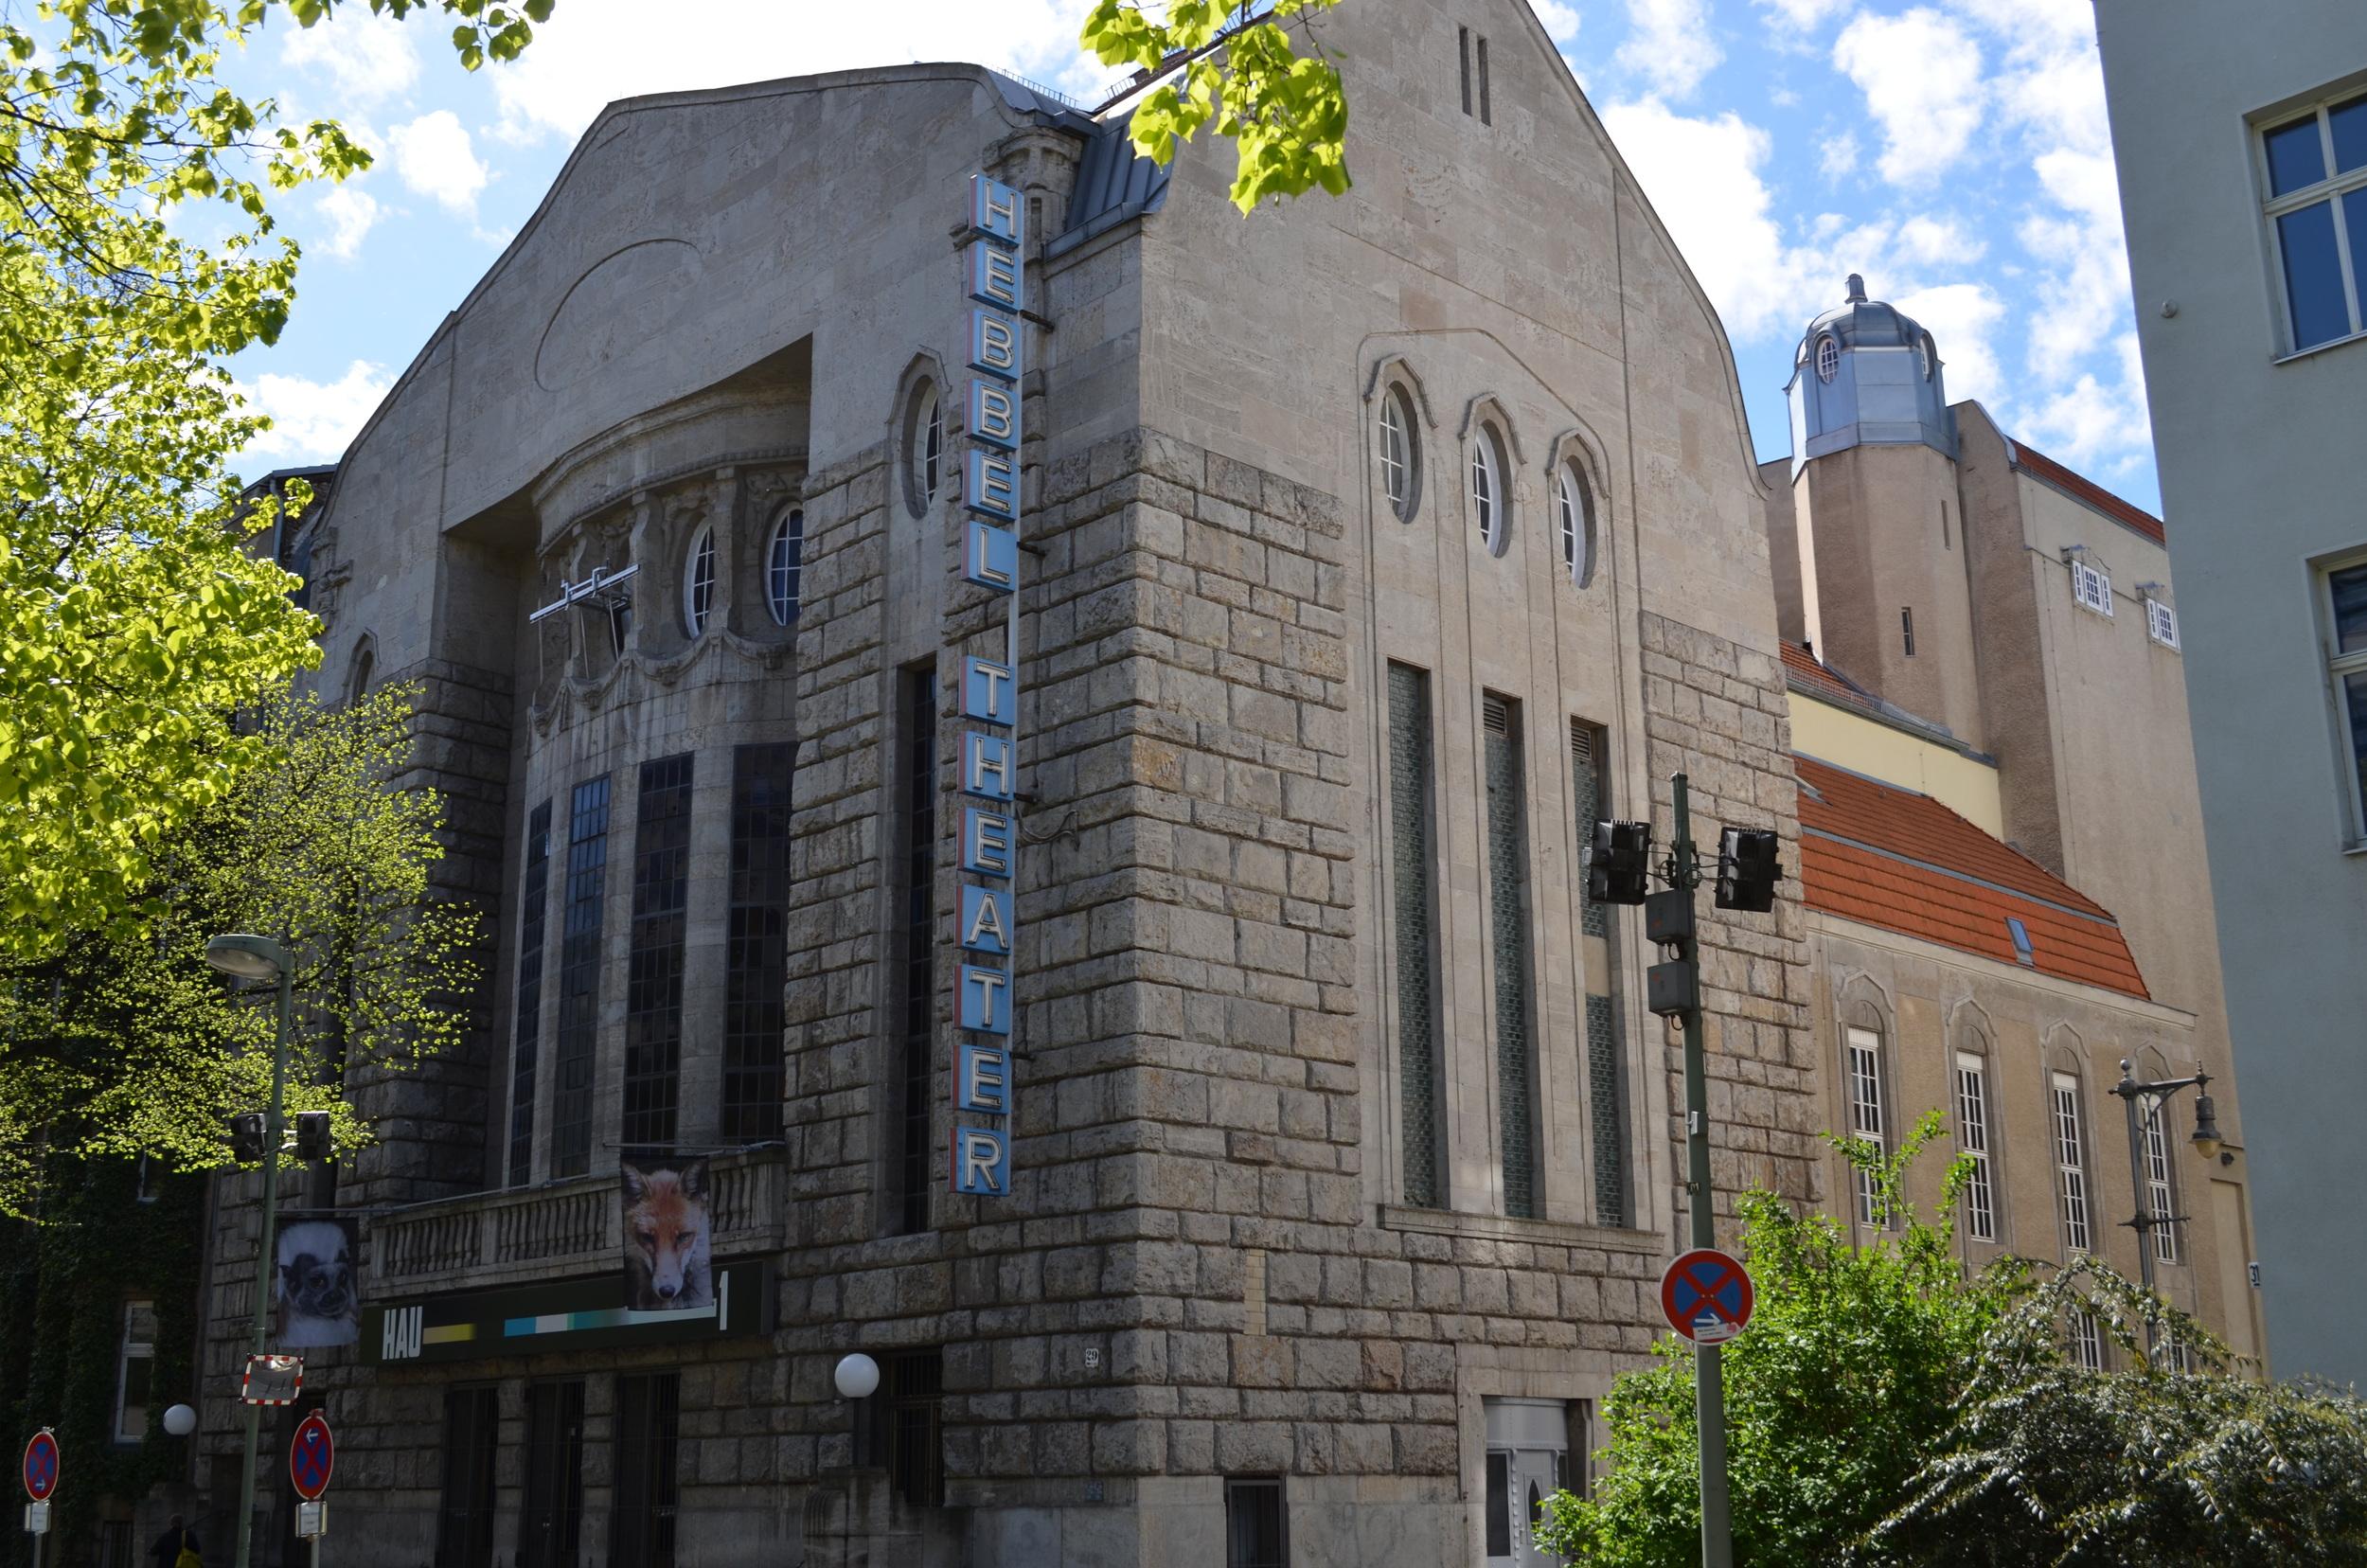 The Hebbel Theater in Kreuzberg.